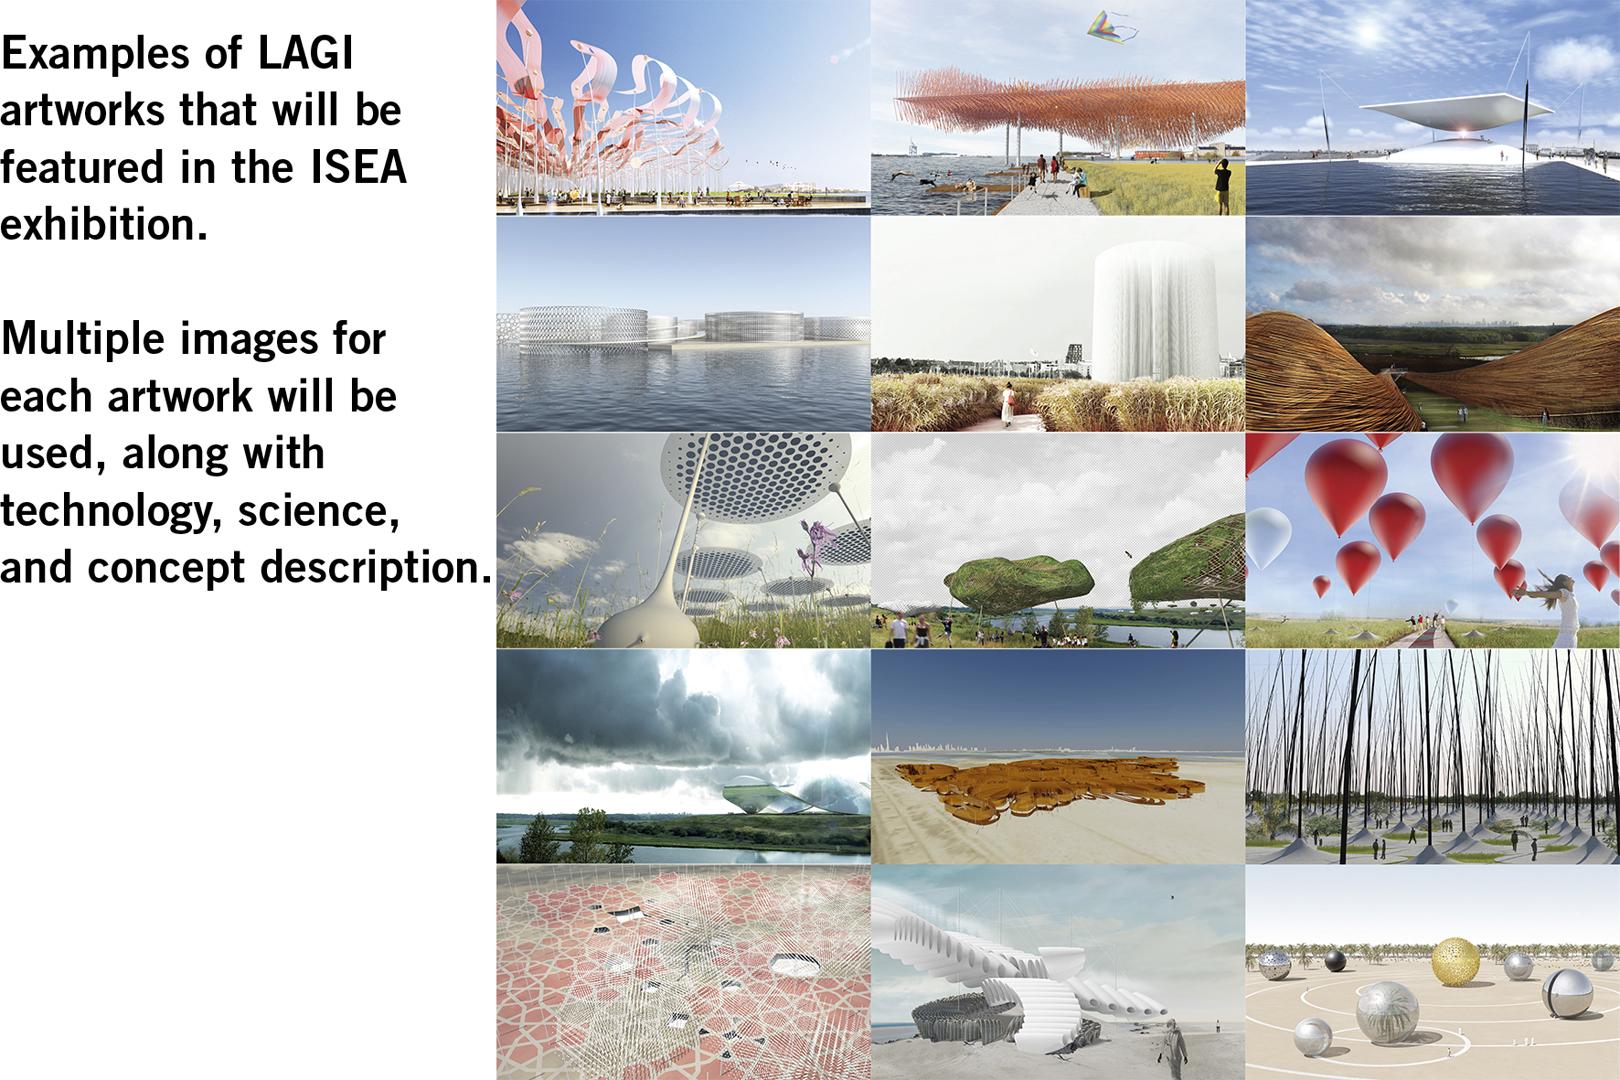 ©ISEA2014: 20th International Symposium on Electronic Art, Elizabeth Monoian and Robert Ferry, Land Art Generator Initiative